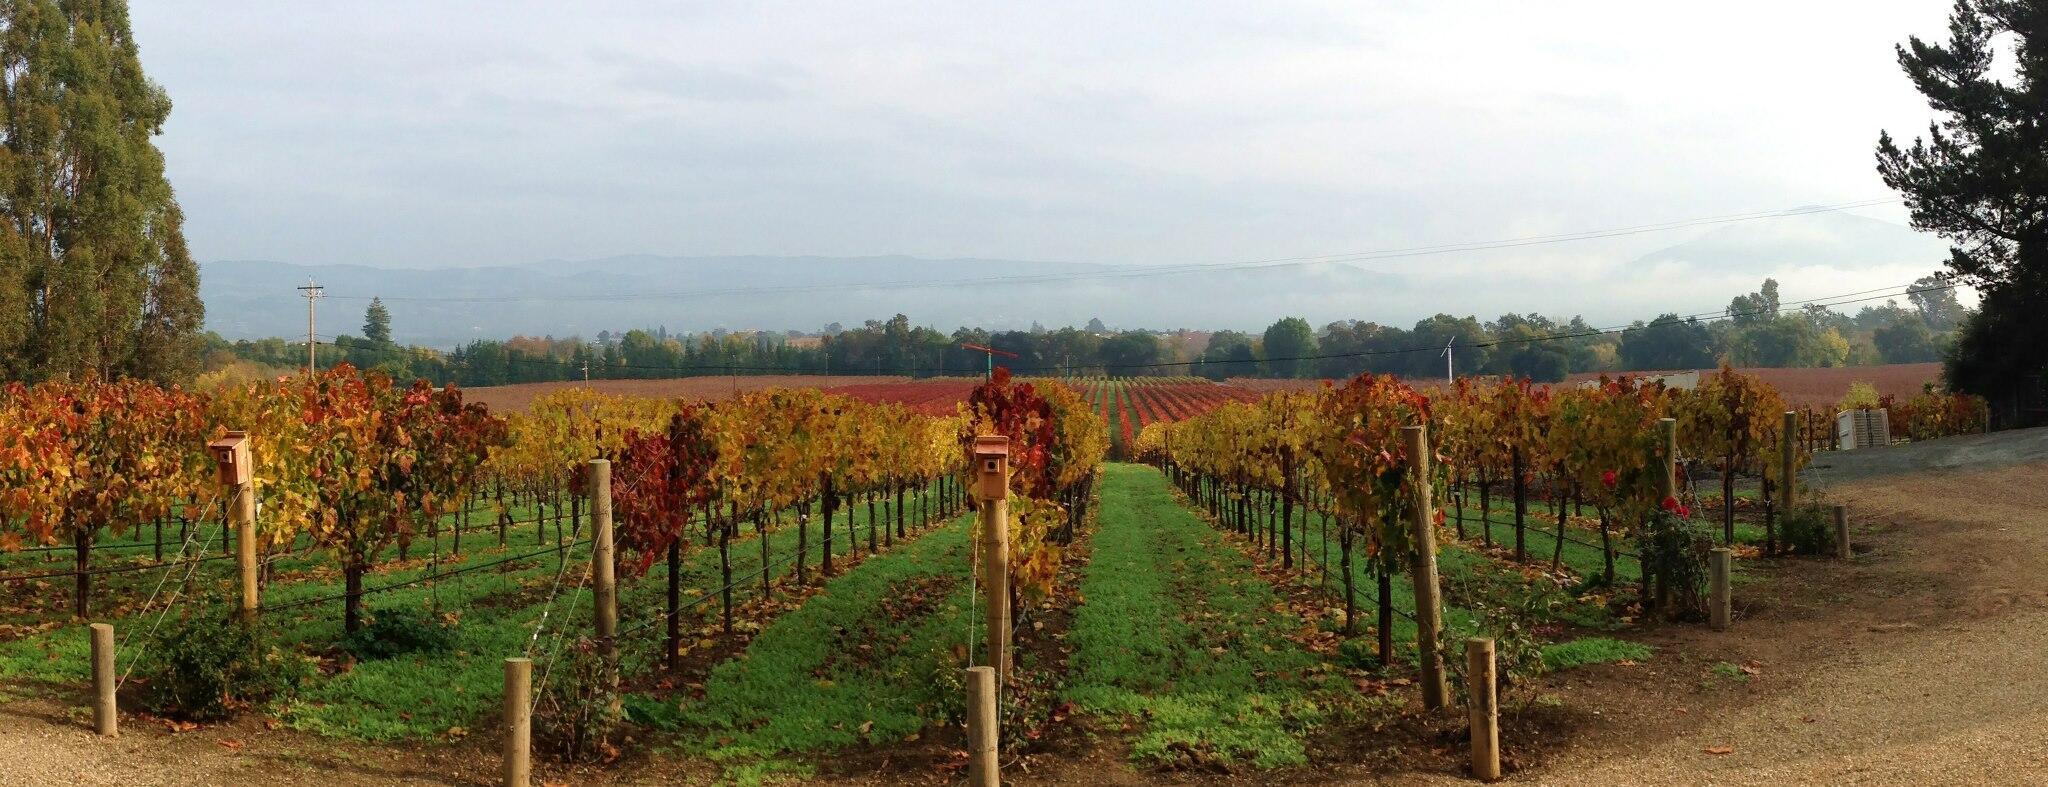 Celani Family Vineyards Cover Image